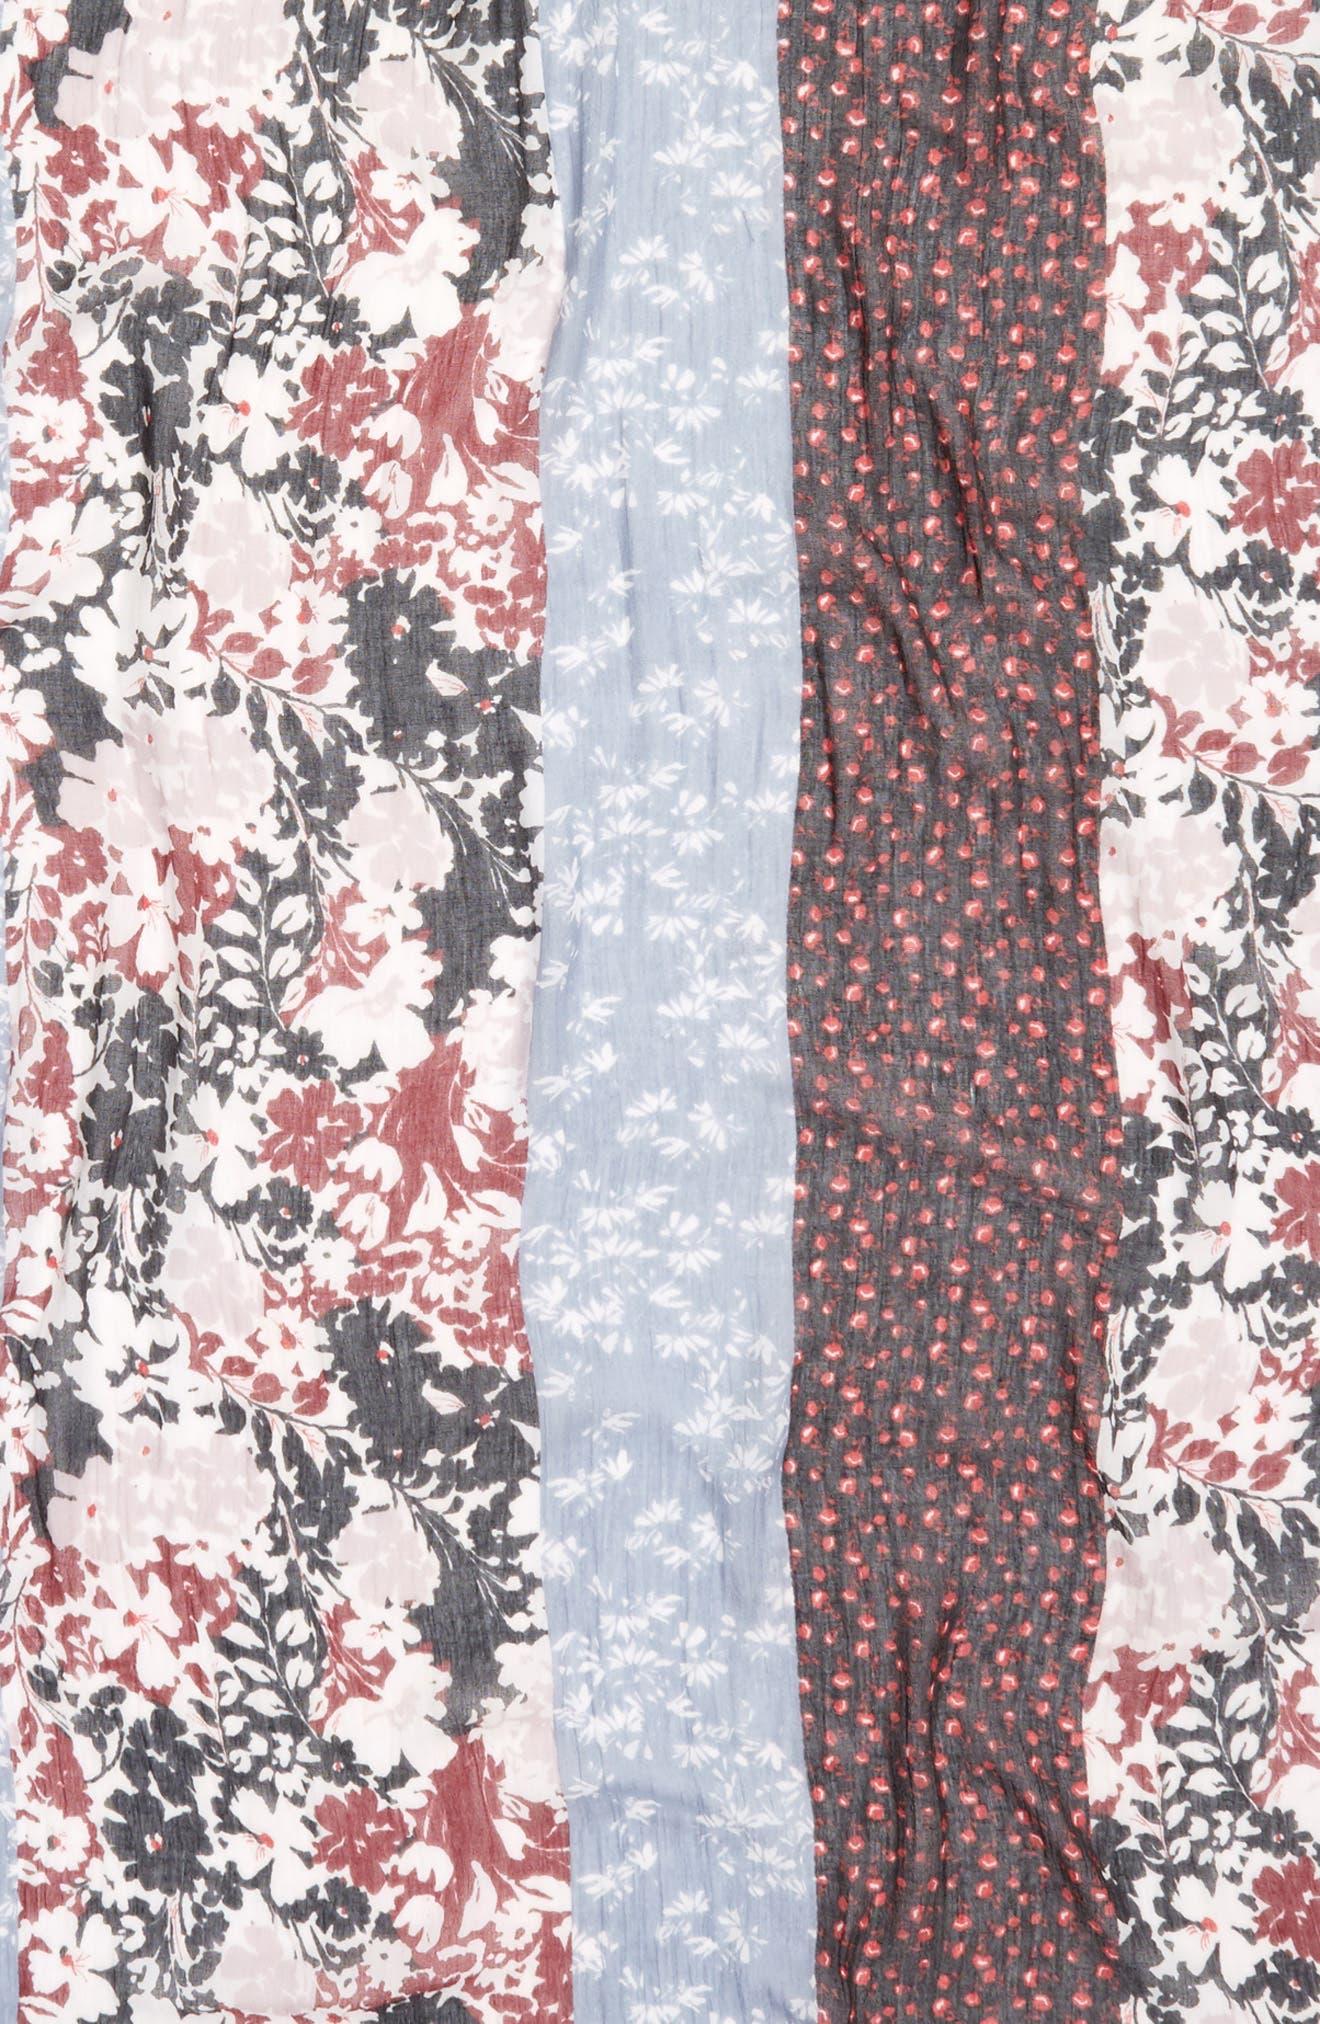 Tassel Trim Printed Wrap,                             Alternate thumbnail 4, color,                             Black Floral Romance Print